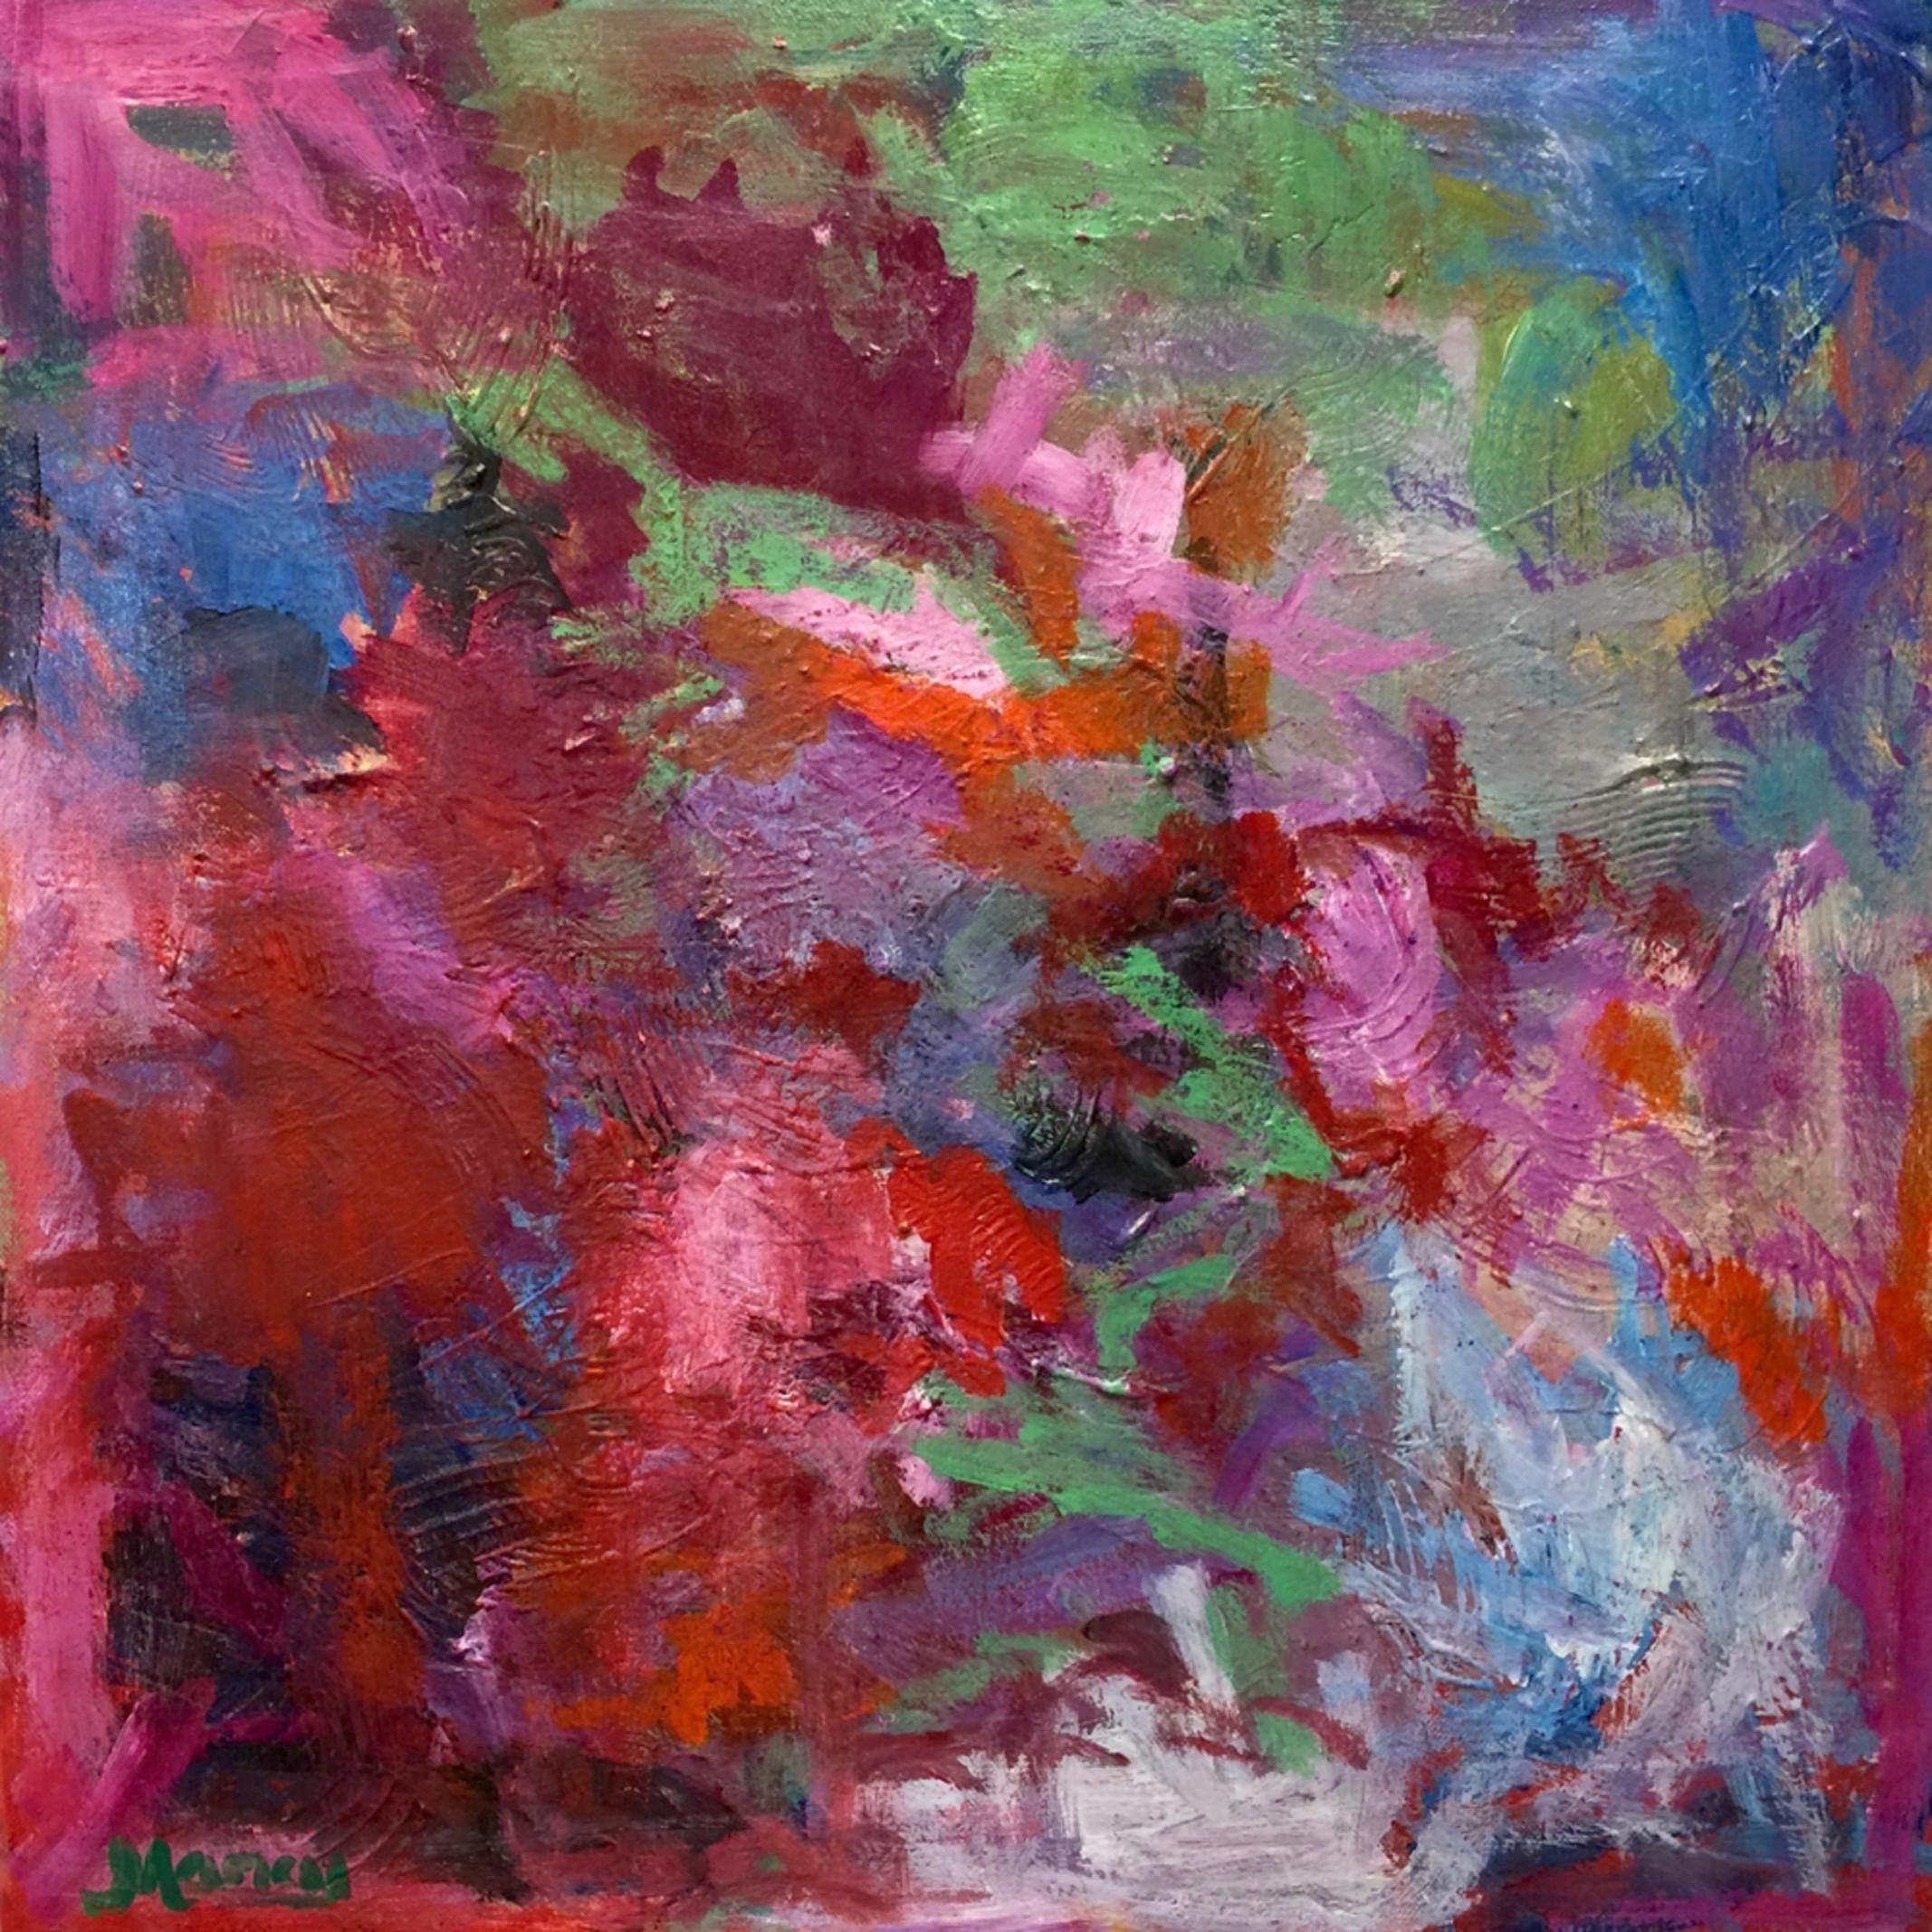 Color splash uf6dqn